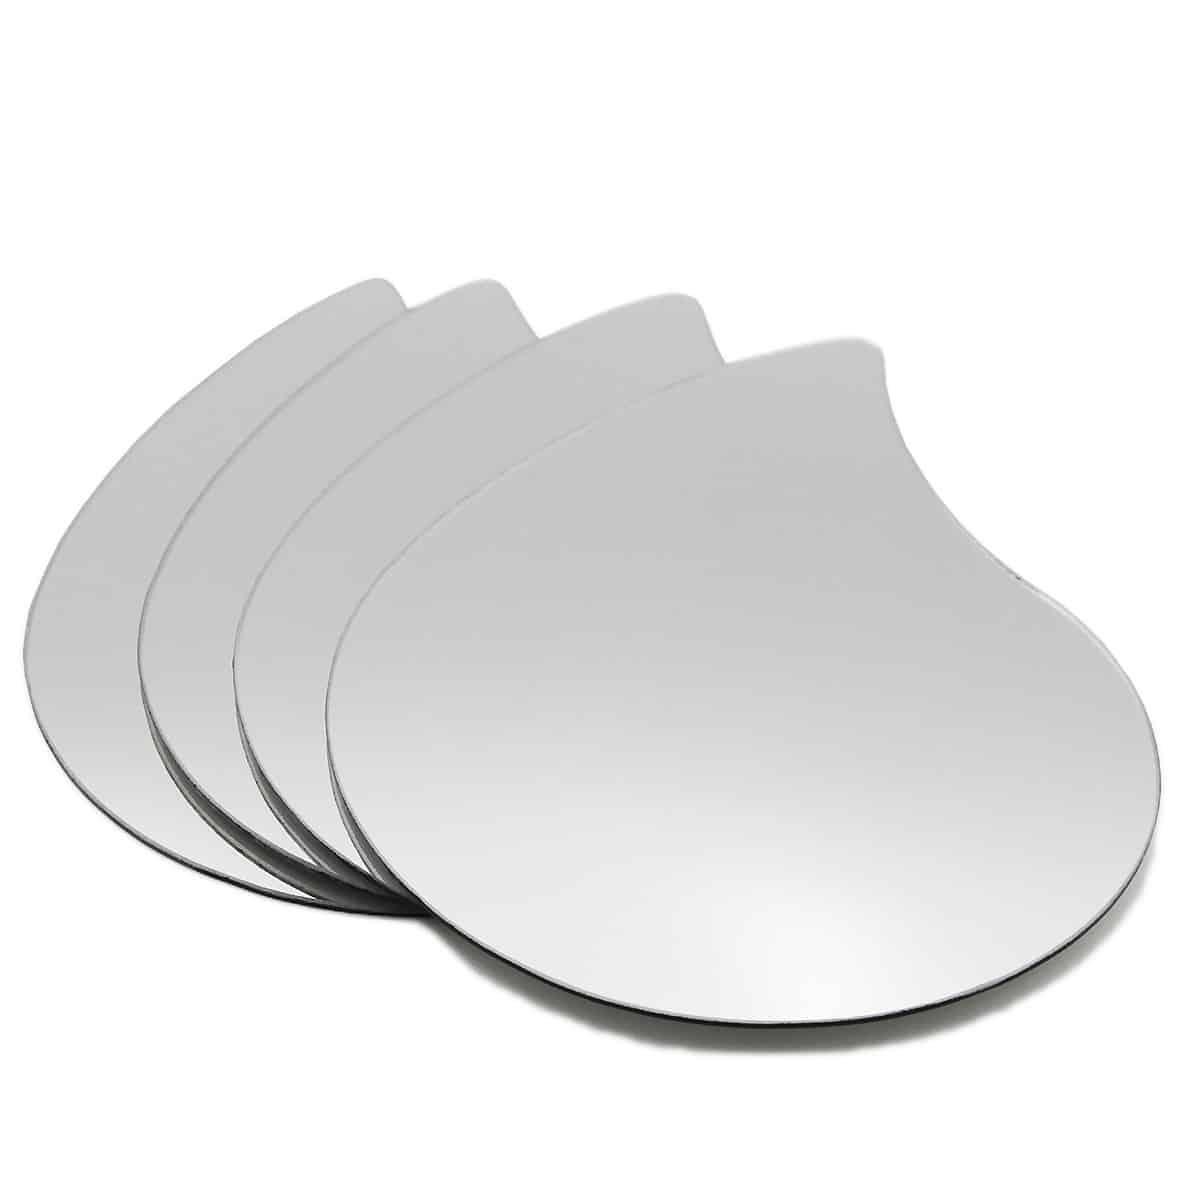 Small Decorative Wall Self Adhesive Shaped Mirrors - Set of 4